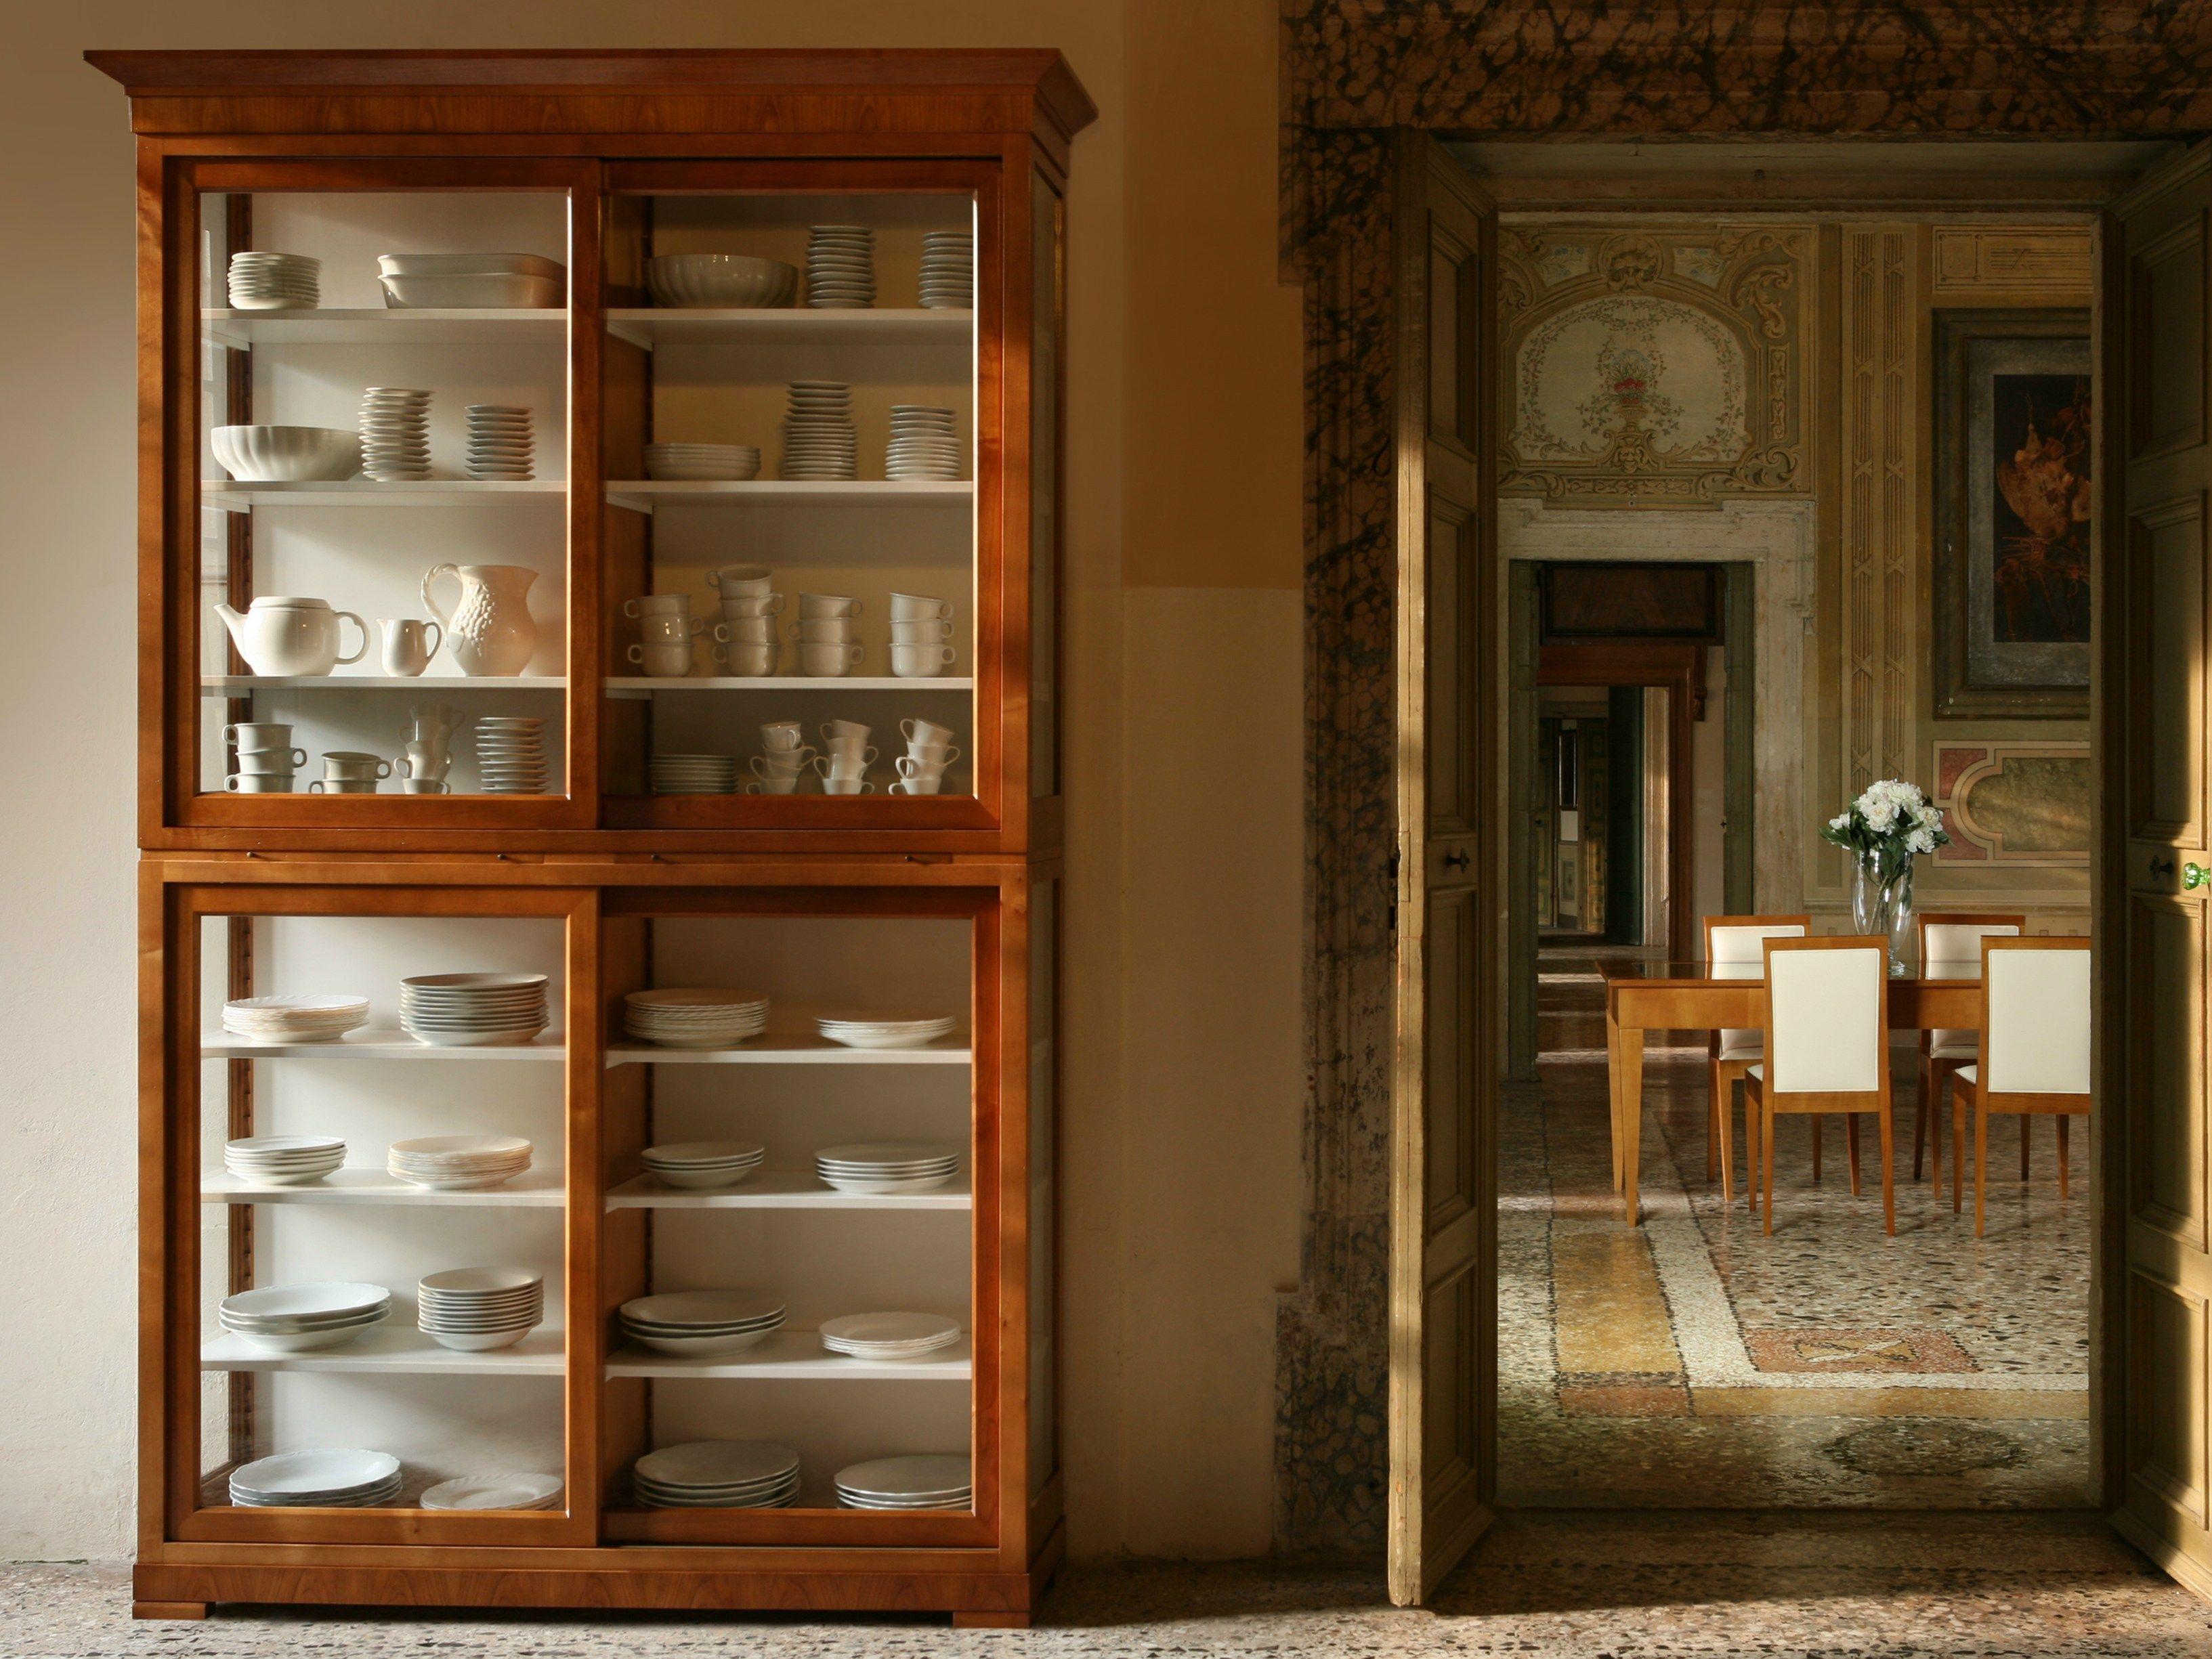 Modulo biedermeier libreria in legno by morelato design centro ricerche maam - Mobili biedermeier ...